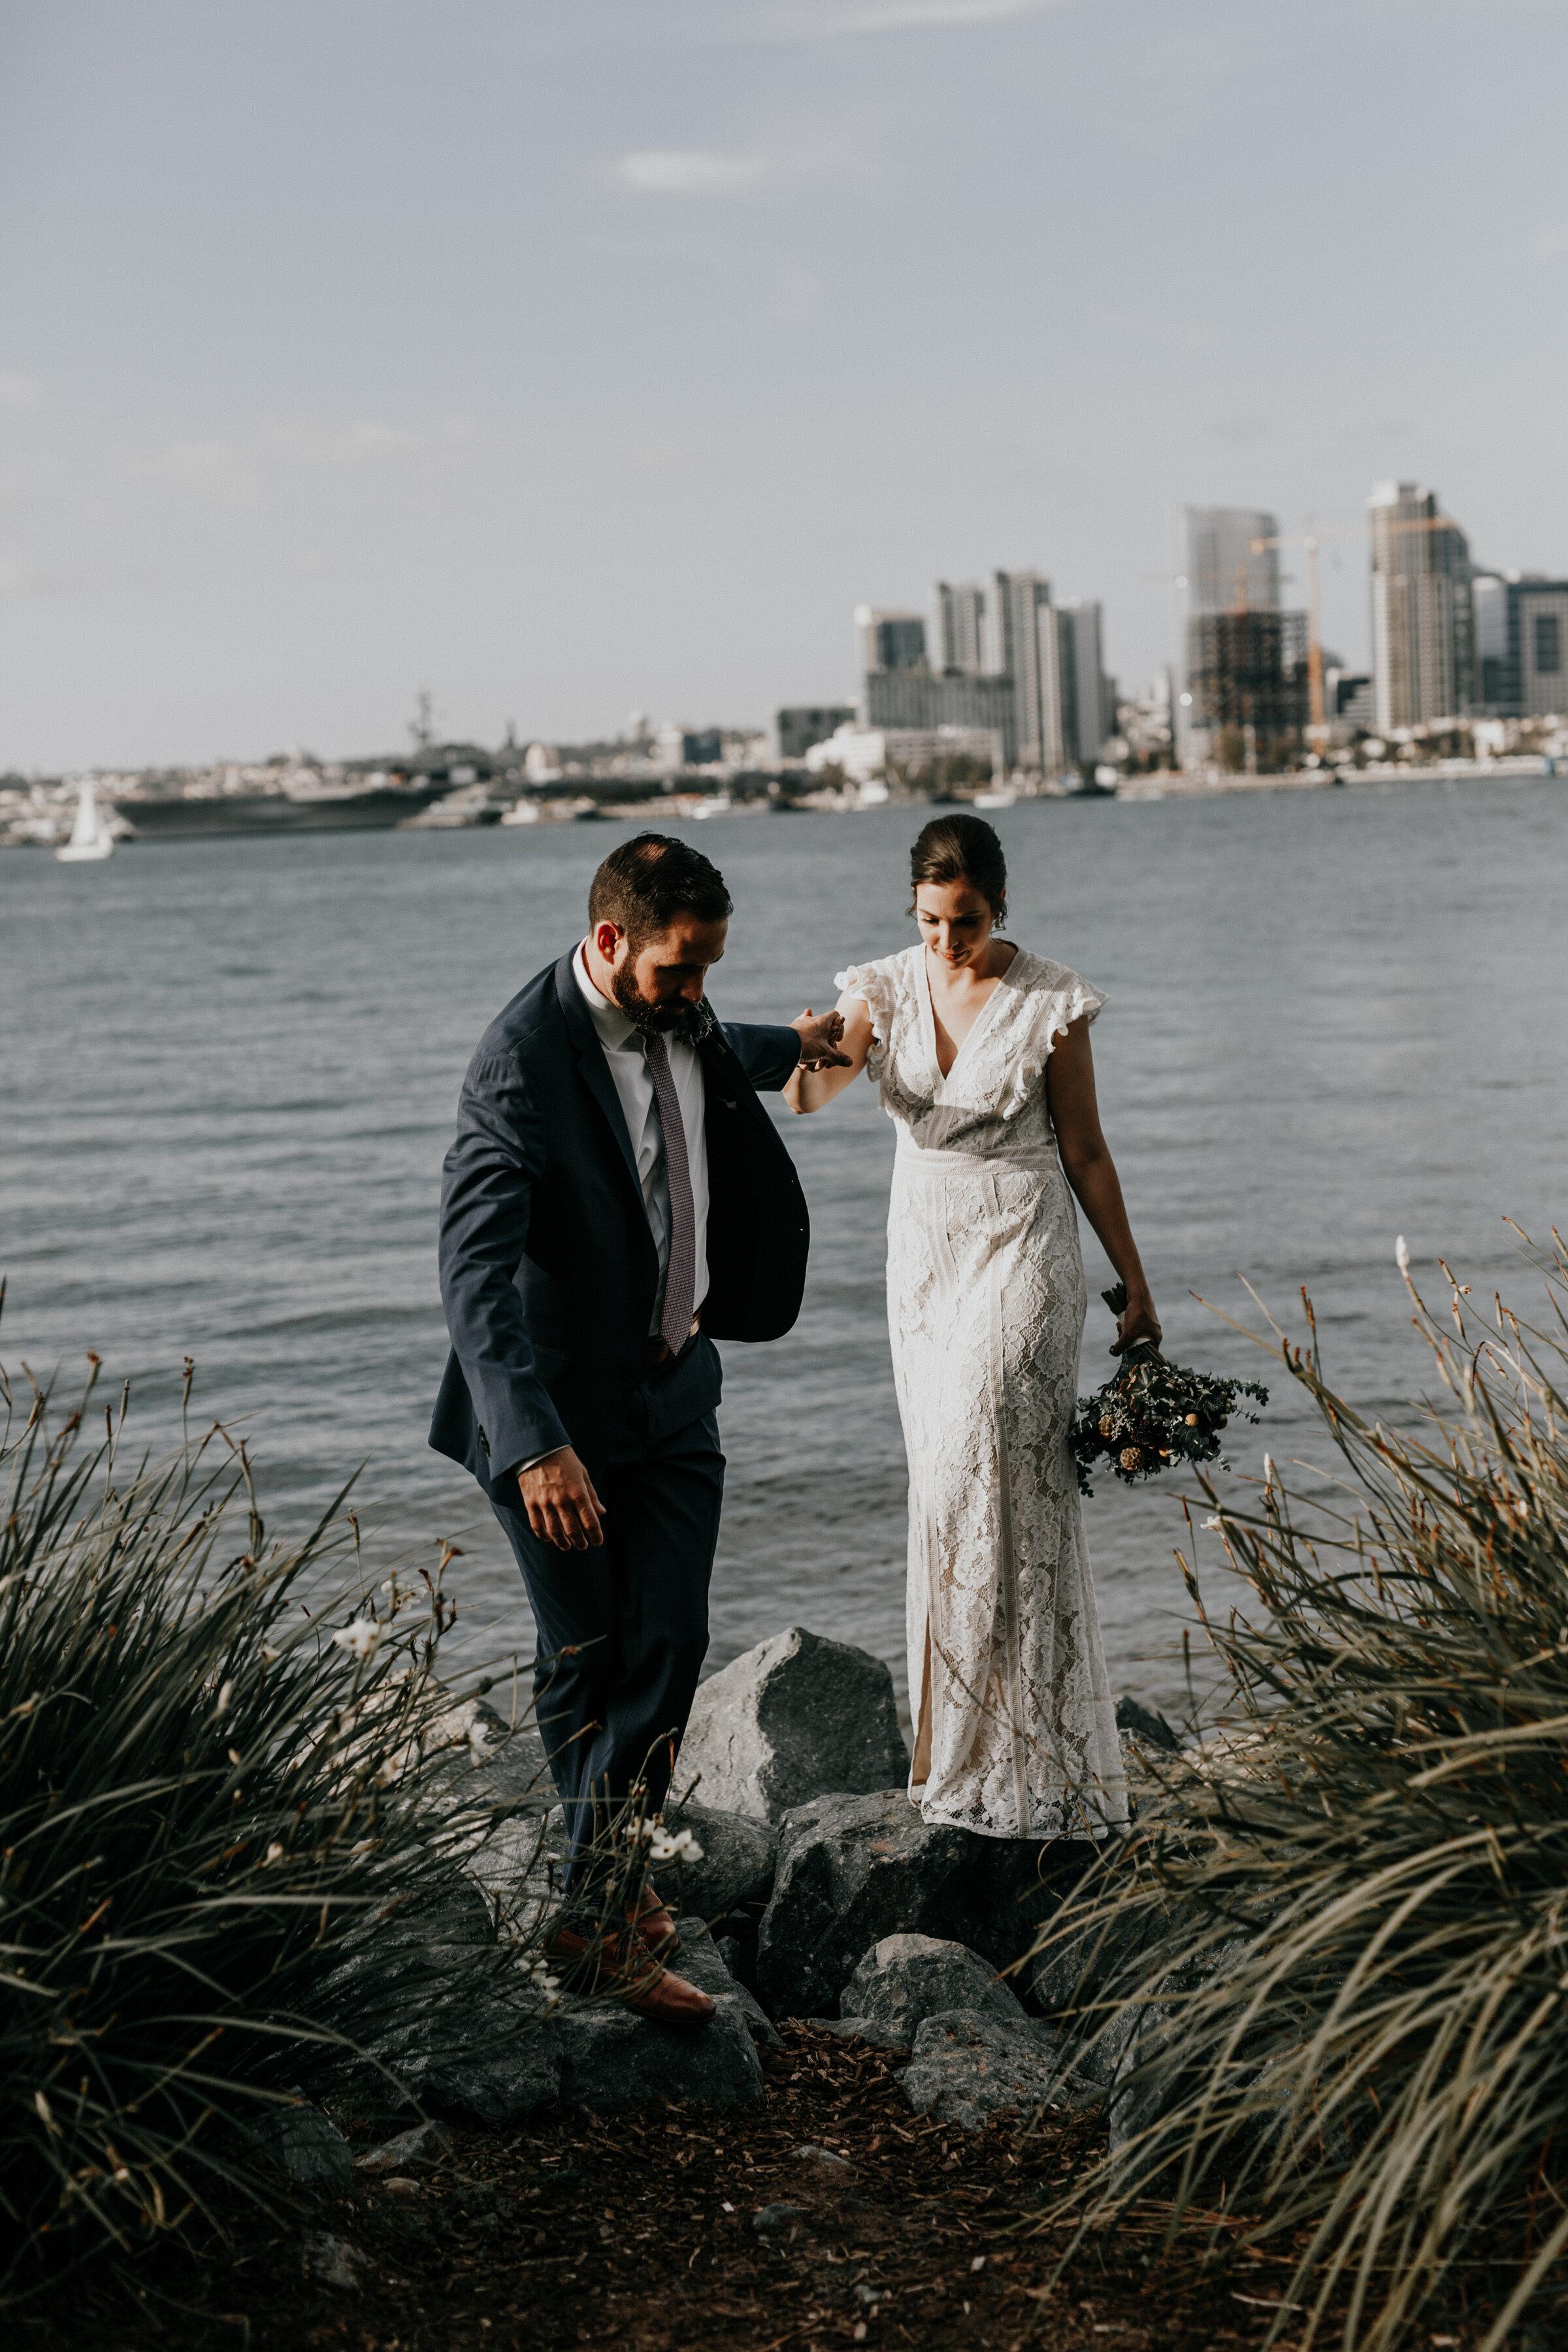 BestweddingphotographerinSanDiego.jpg